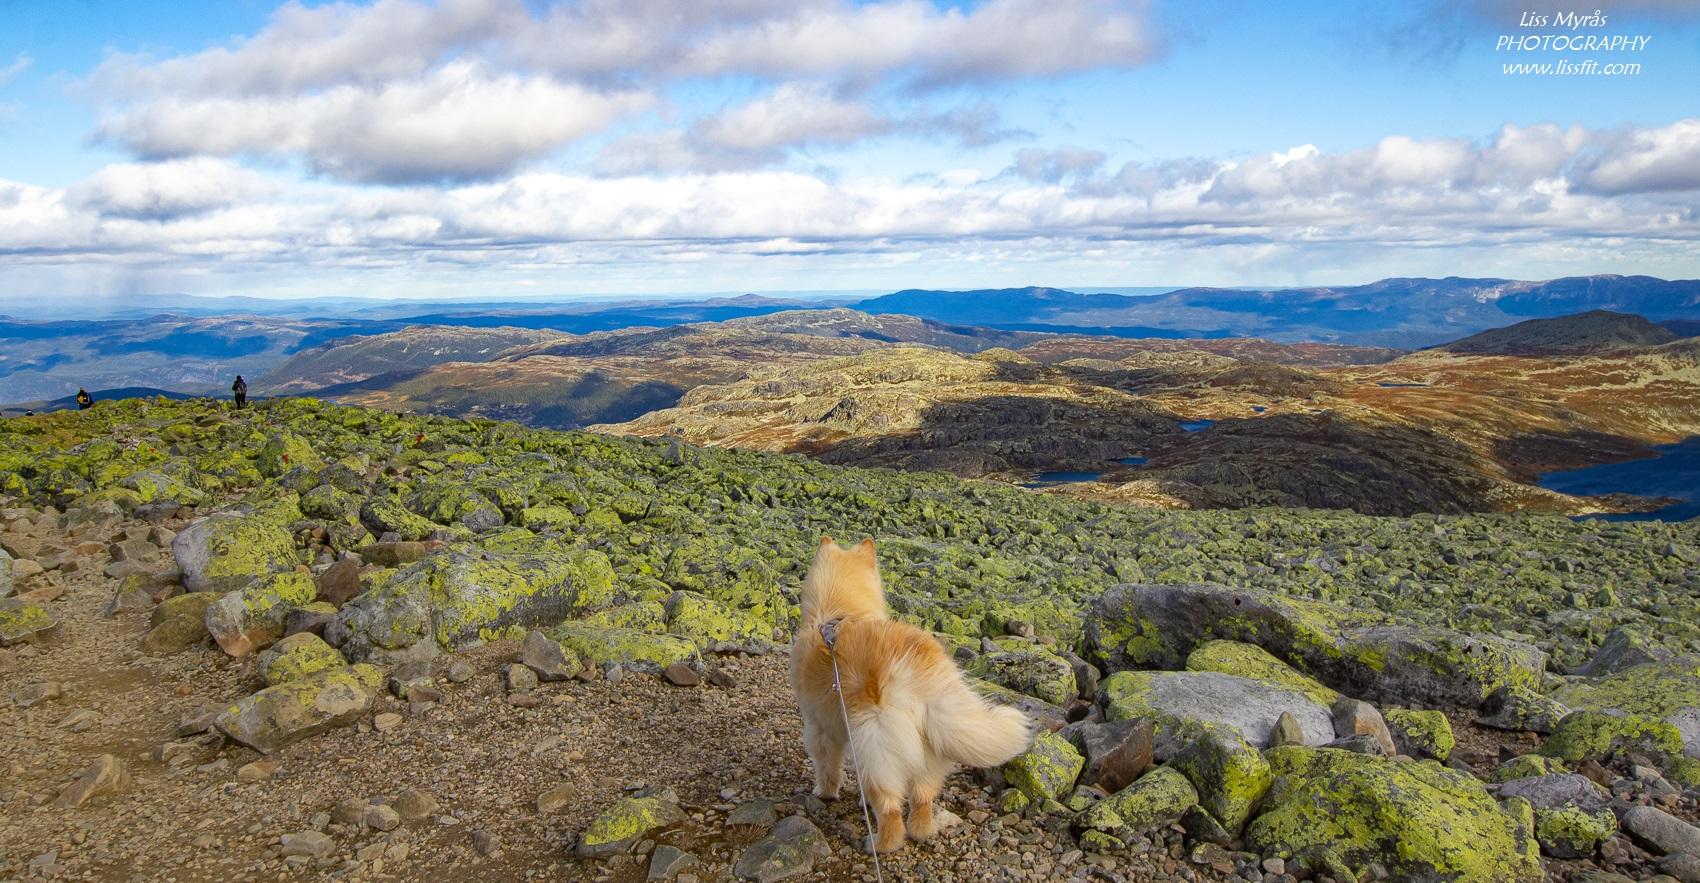 Gaustatoppen topptur hike landscape photo fjelltur lapphund dog scenic views telemark Norway